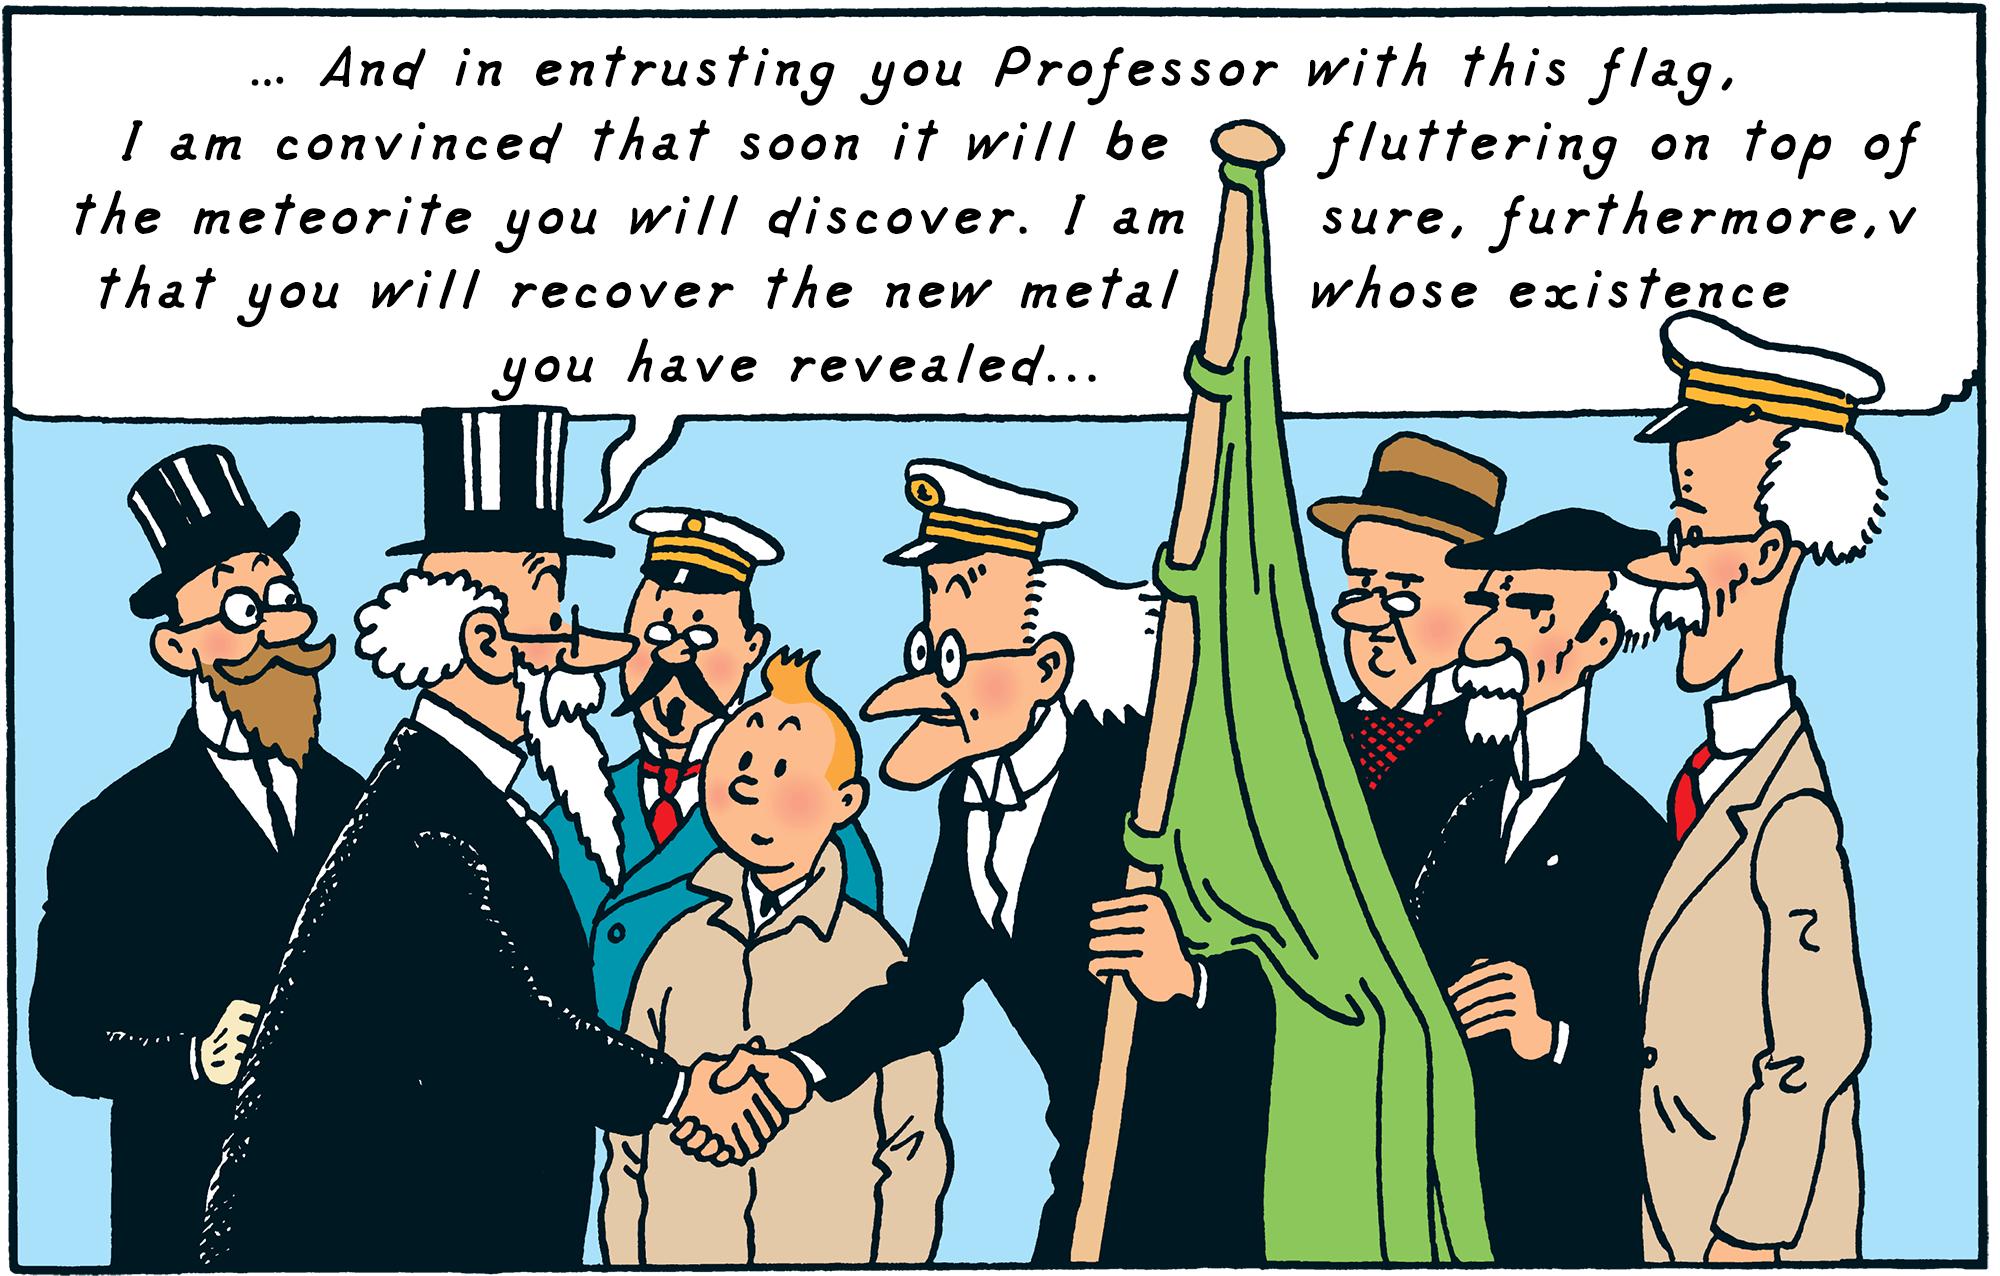 Tintin - The Adventures of Tintin - The Shooting Star